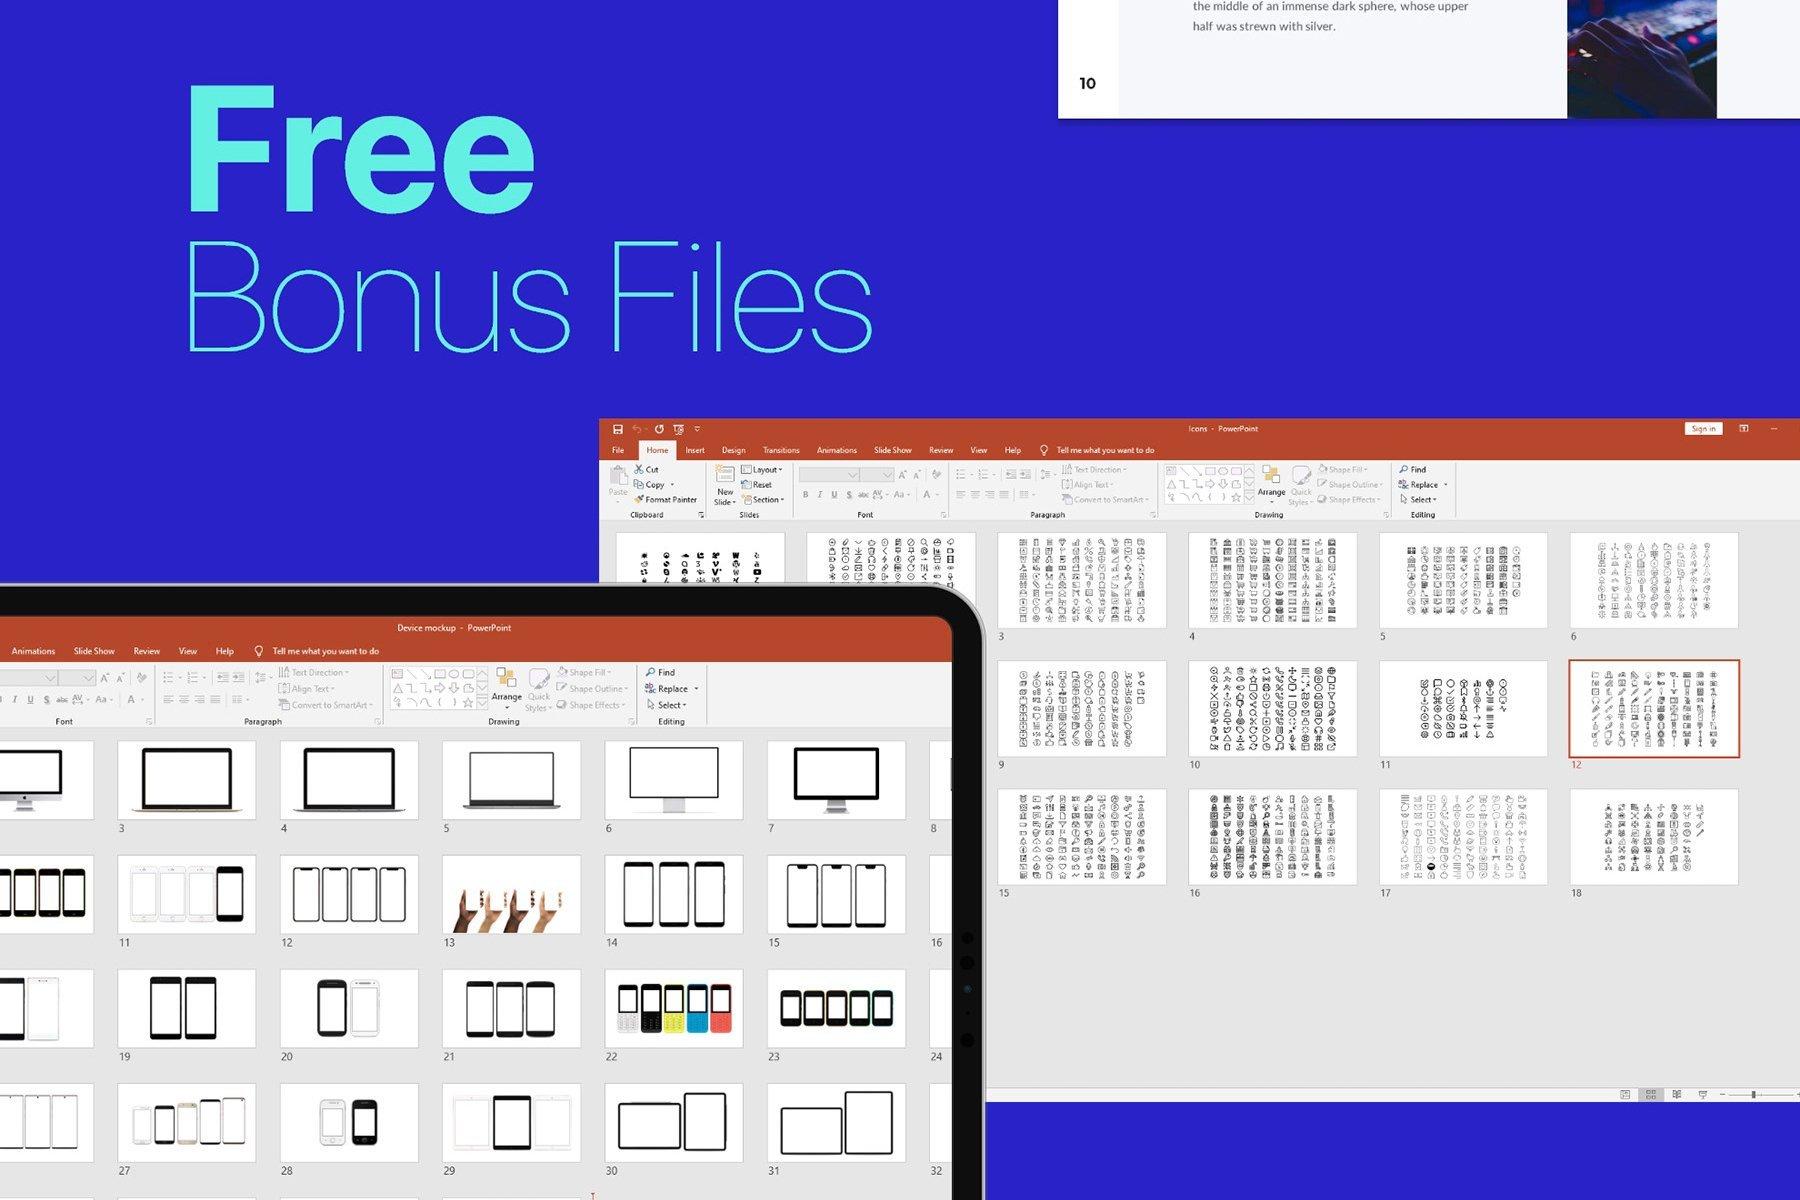 Free bonus files.